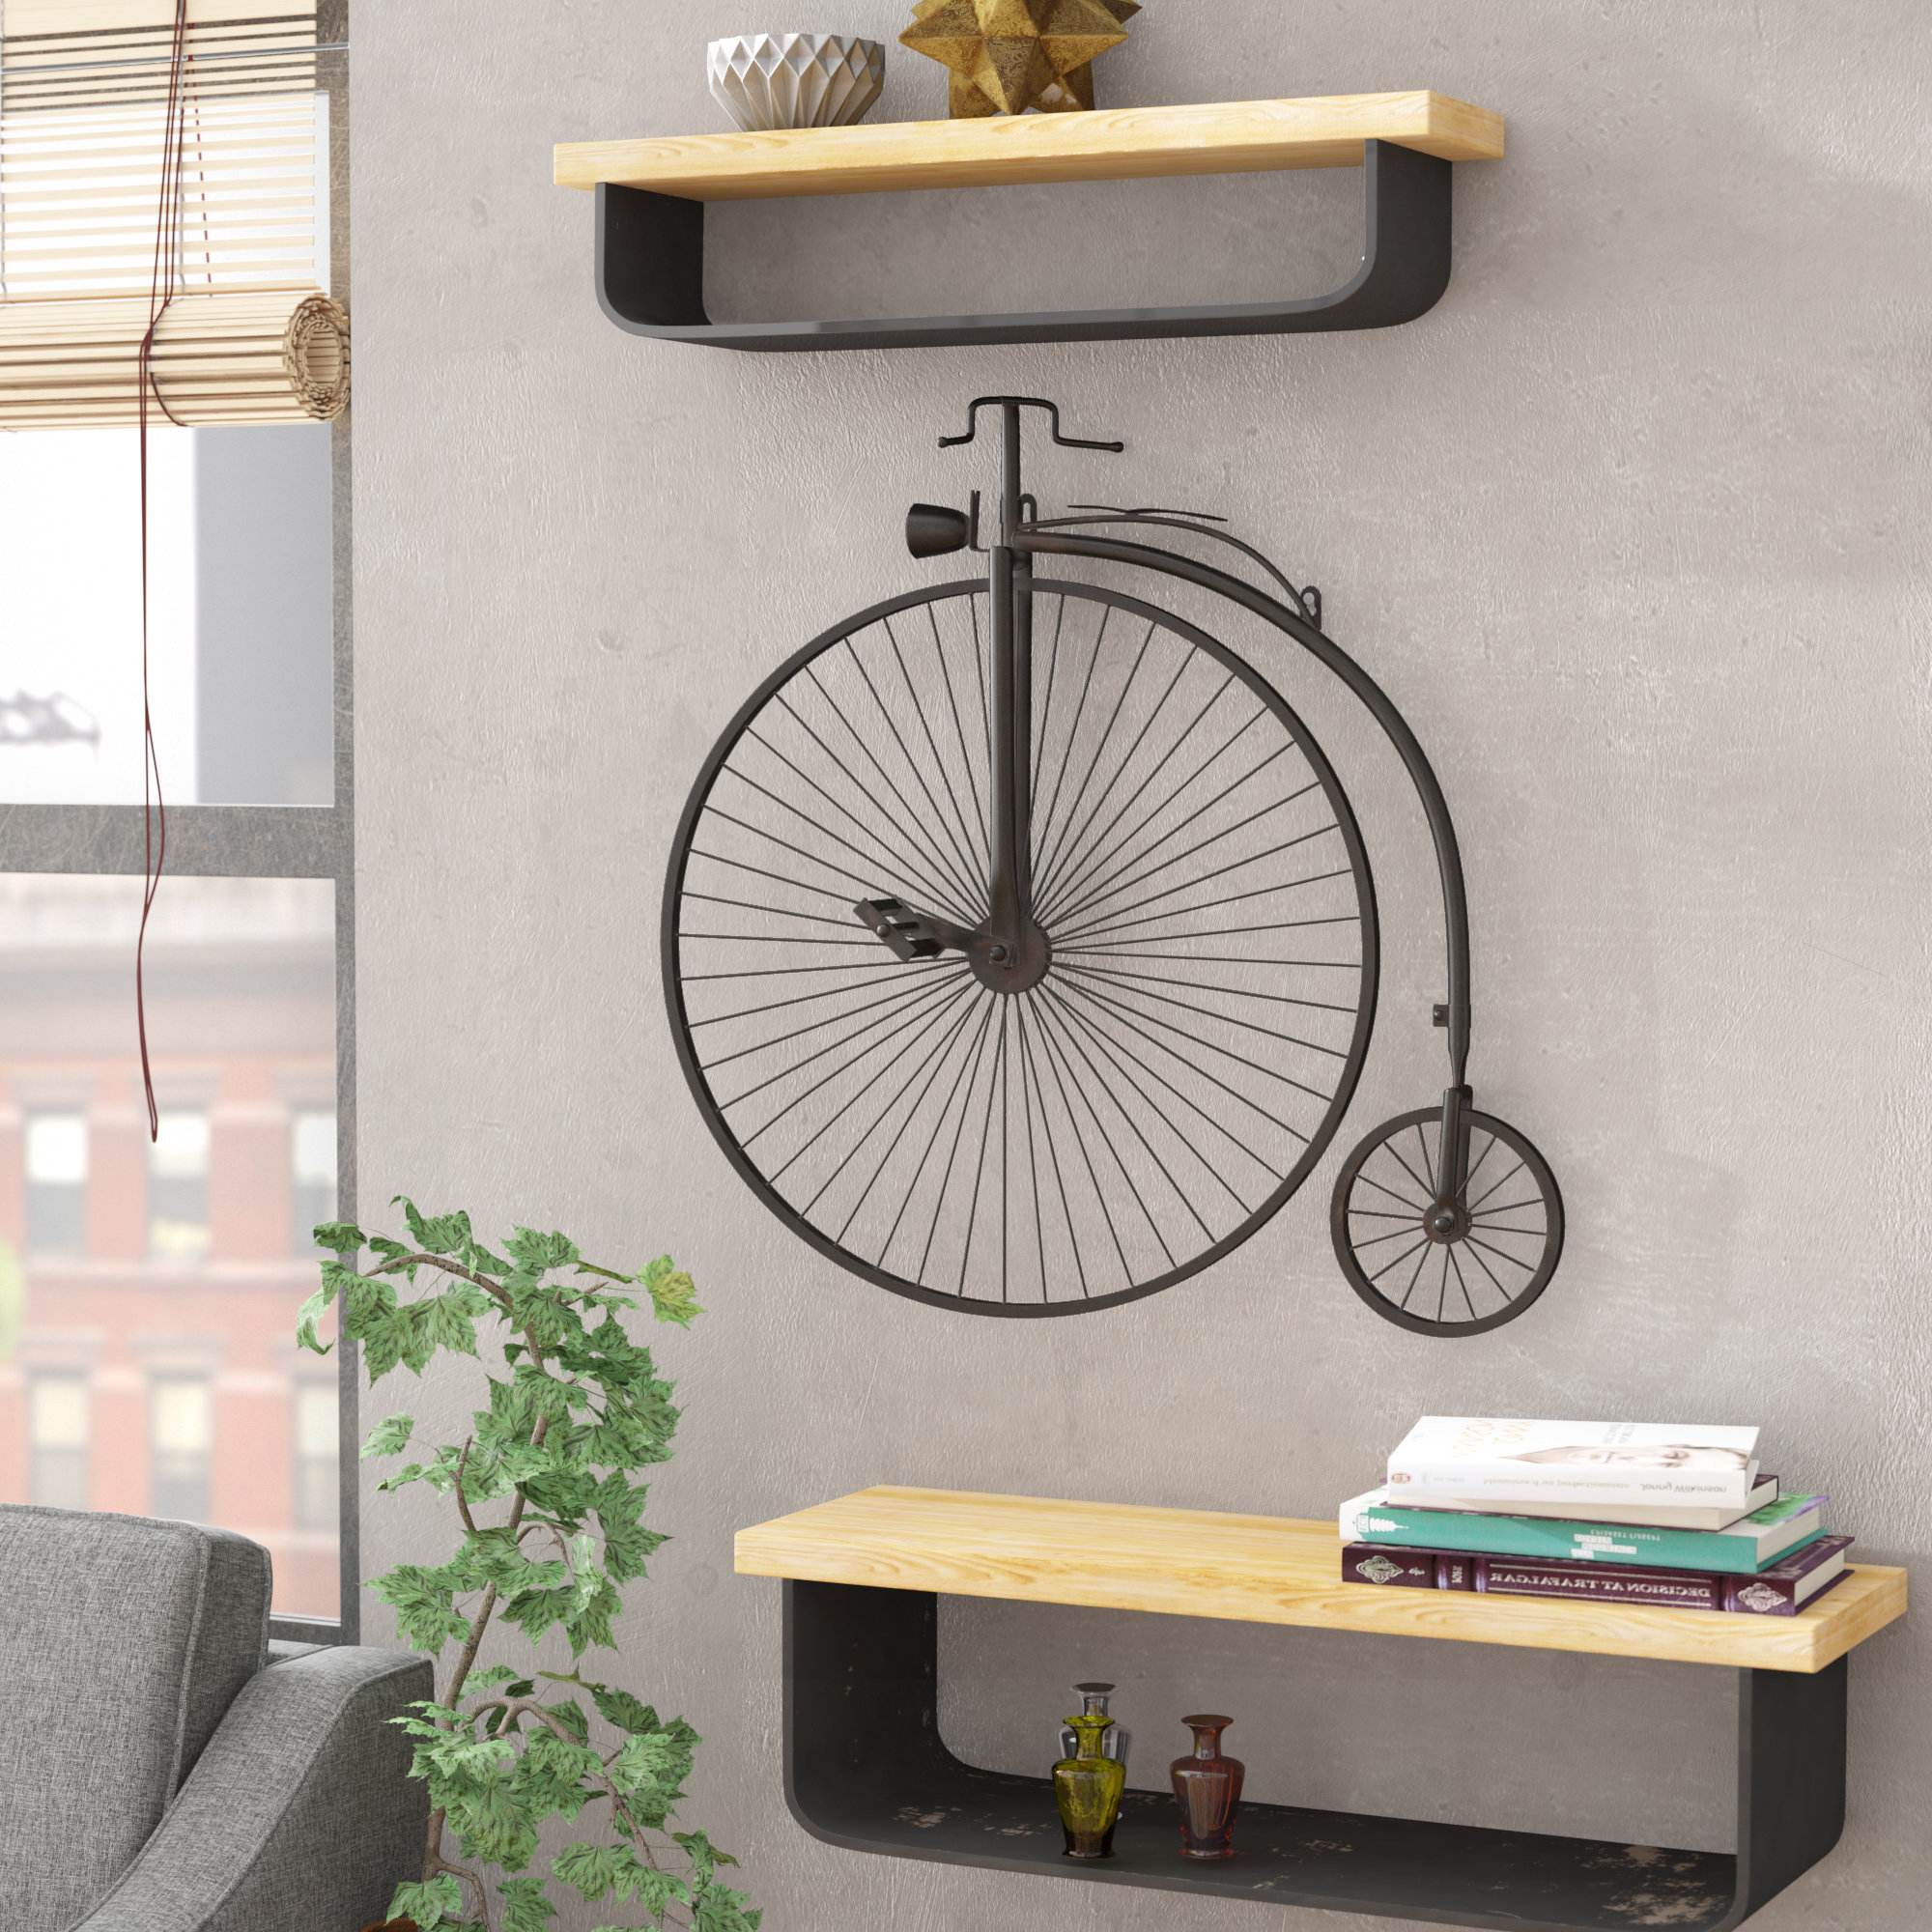 Large Metal Bike Decor | Wayfair for Millanocket Metal Wheel Photo Holder Wall Decor (Image 18 of 30)